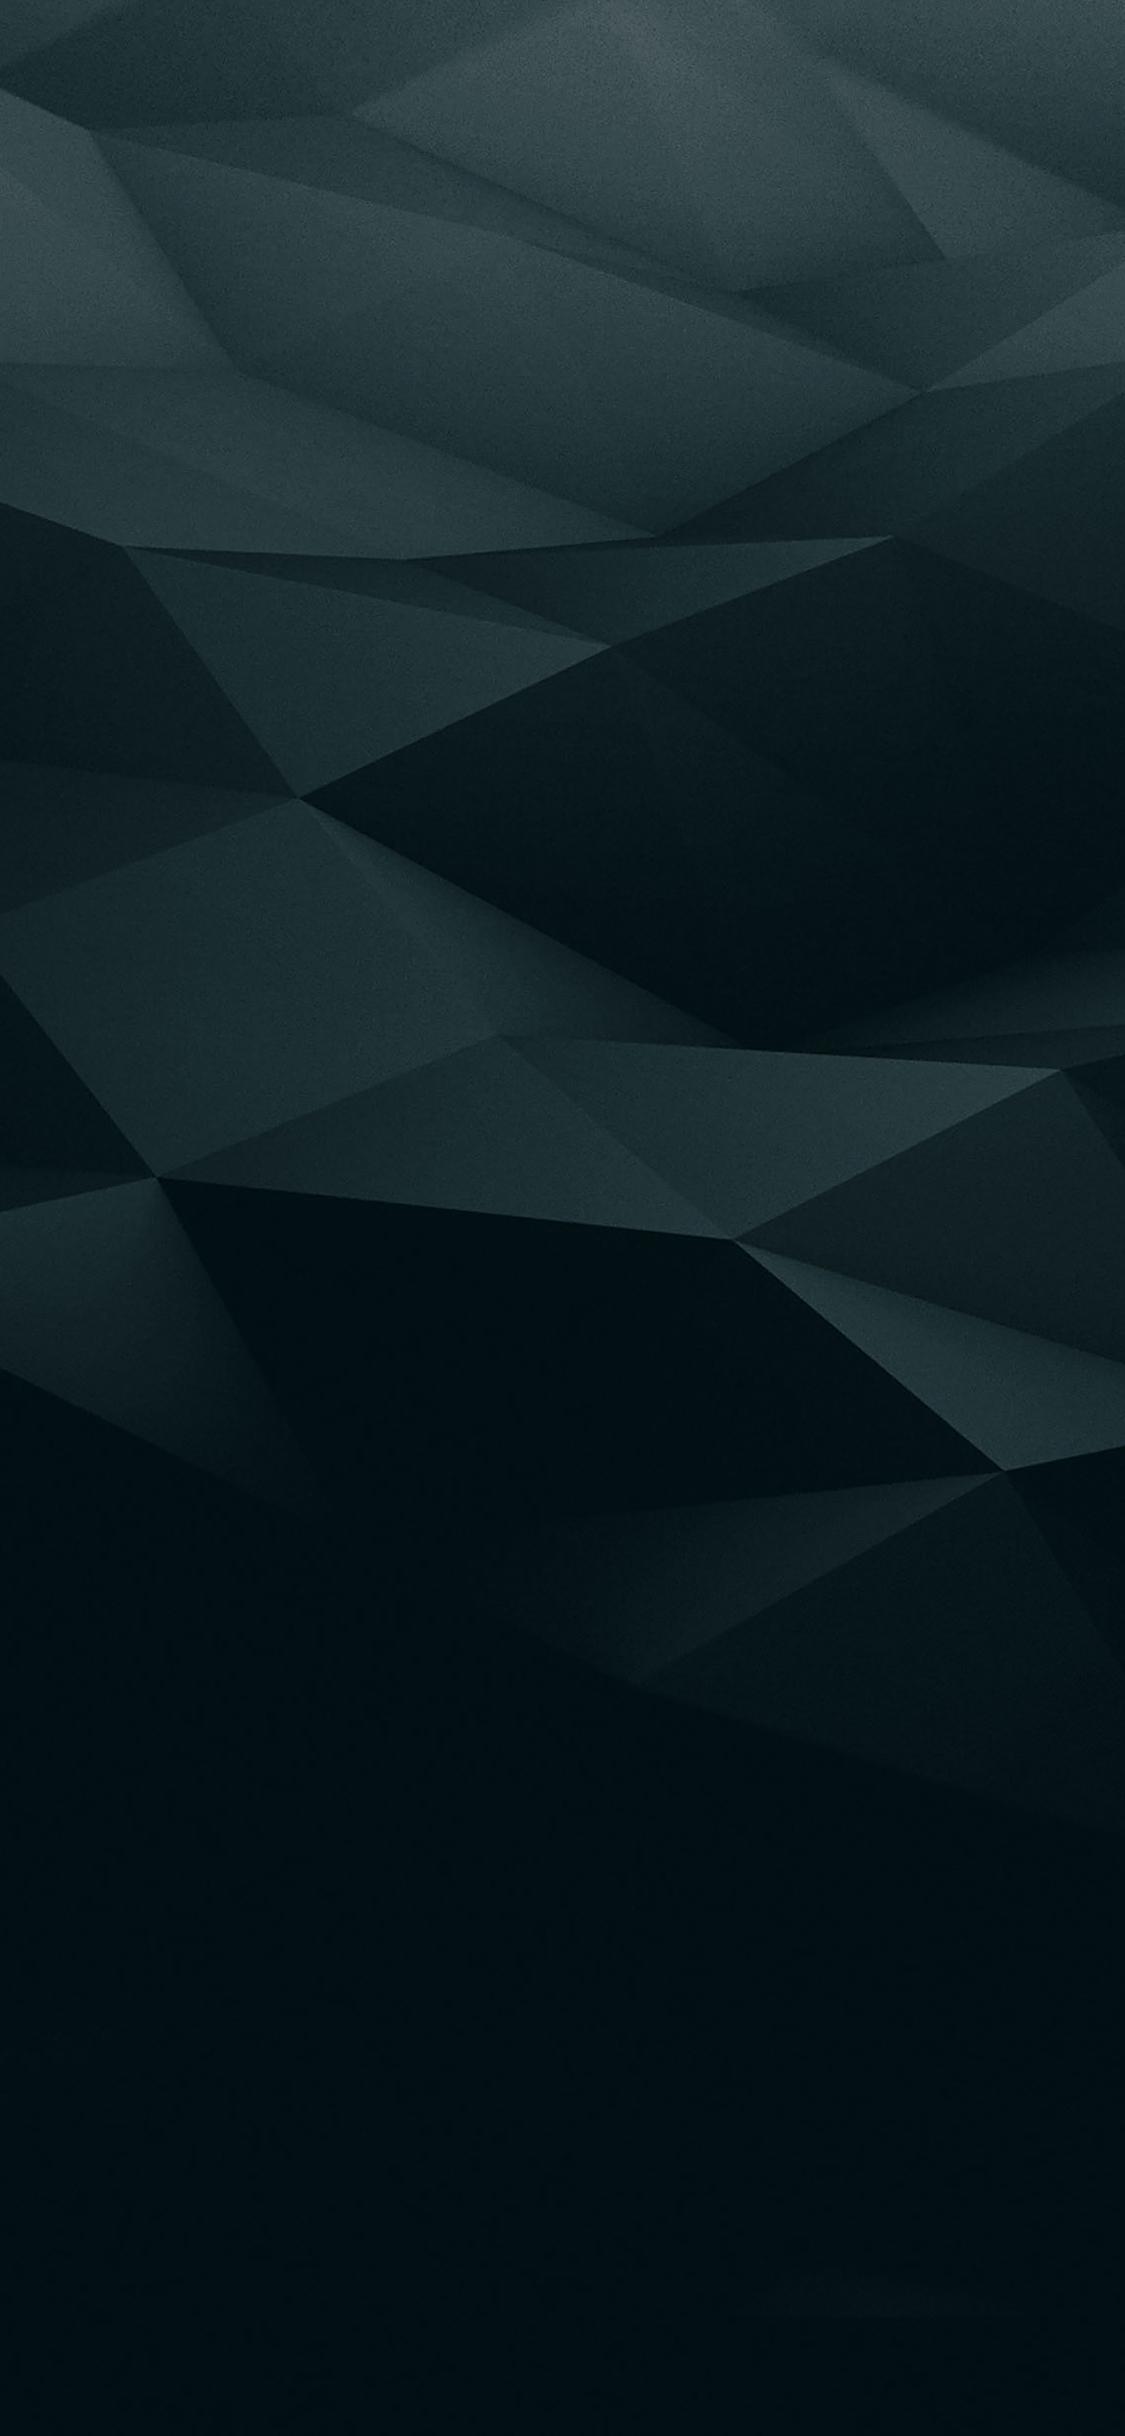 iPhoneXpapers.com-Apple-iPhone-wallpaper-va26-noir-2-dark-pattern